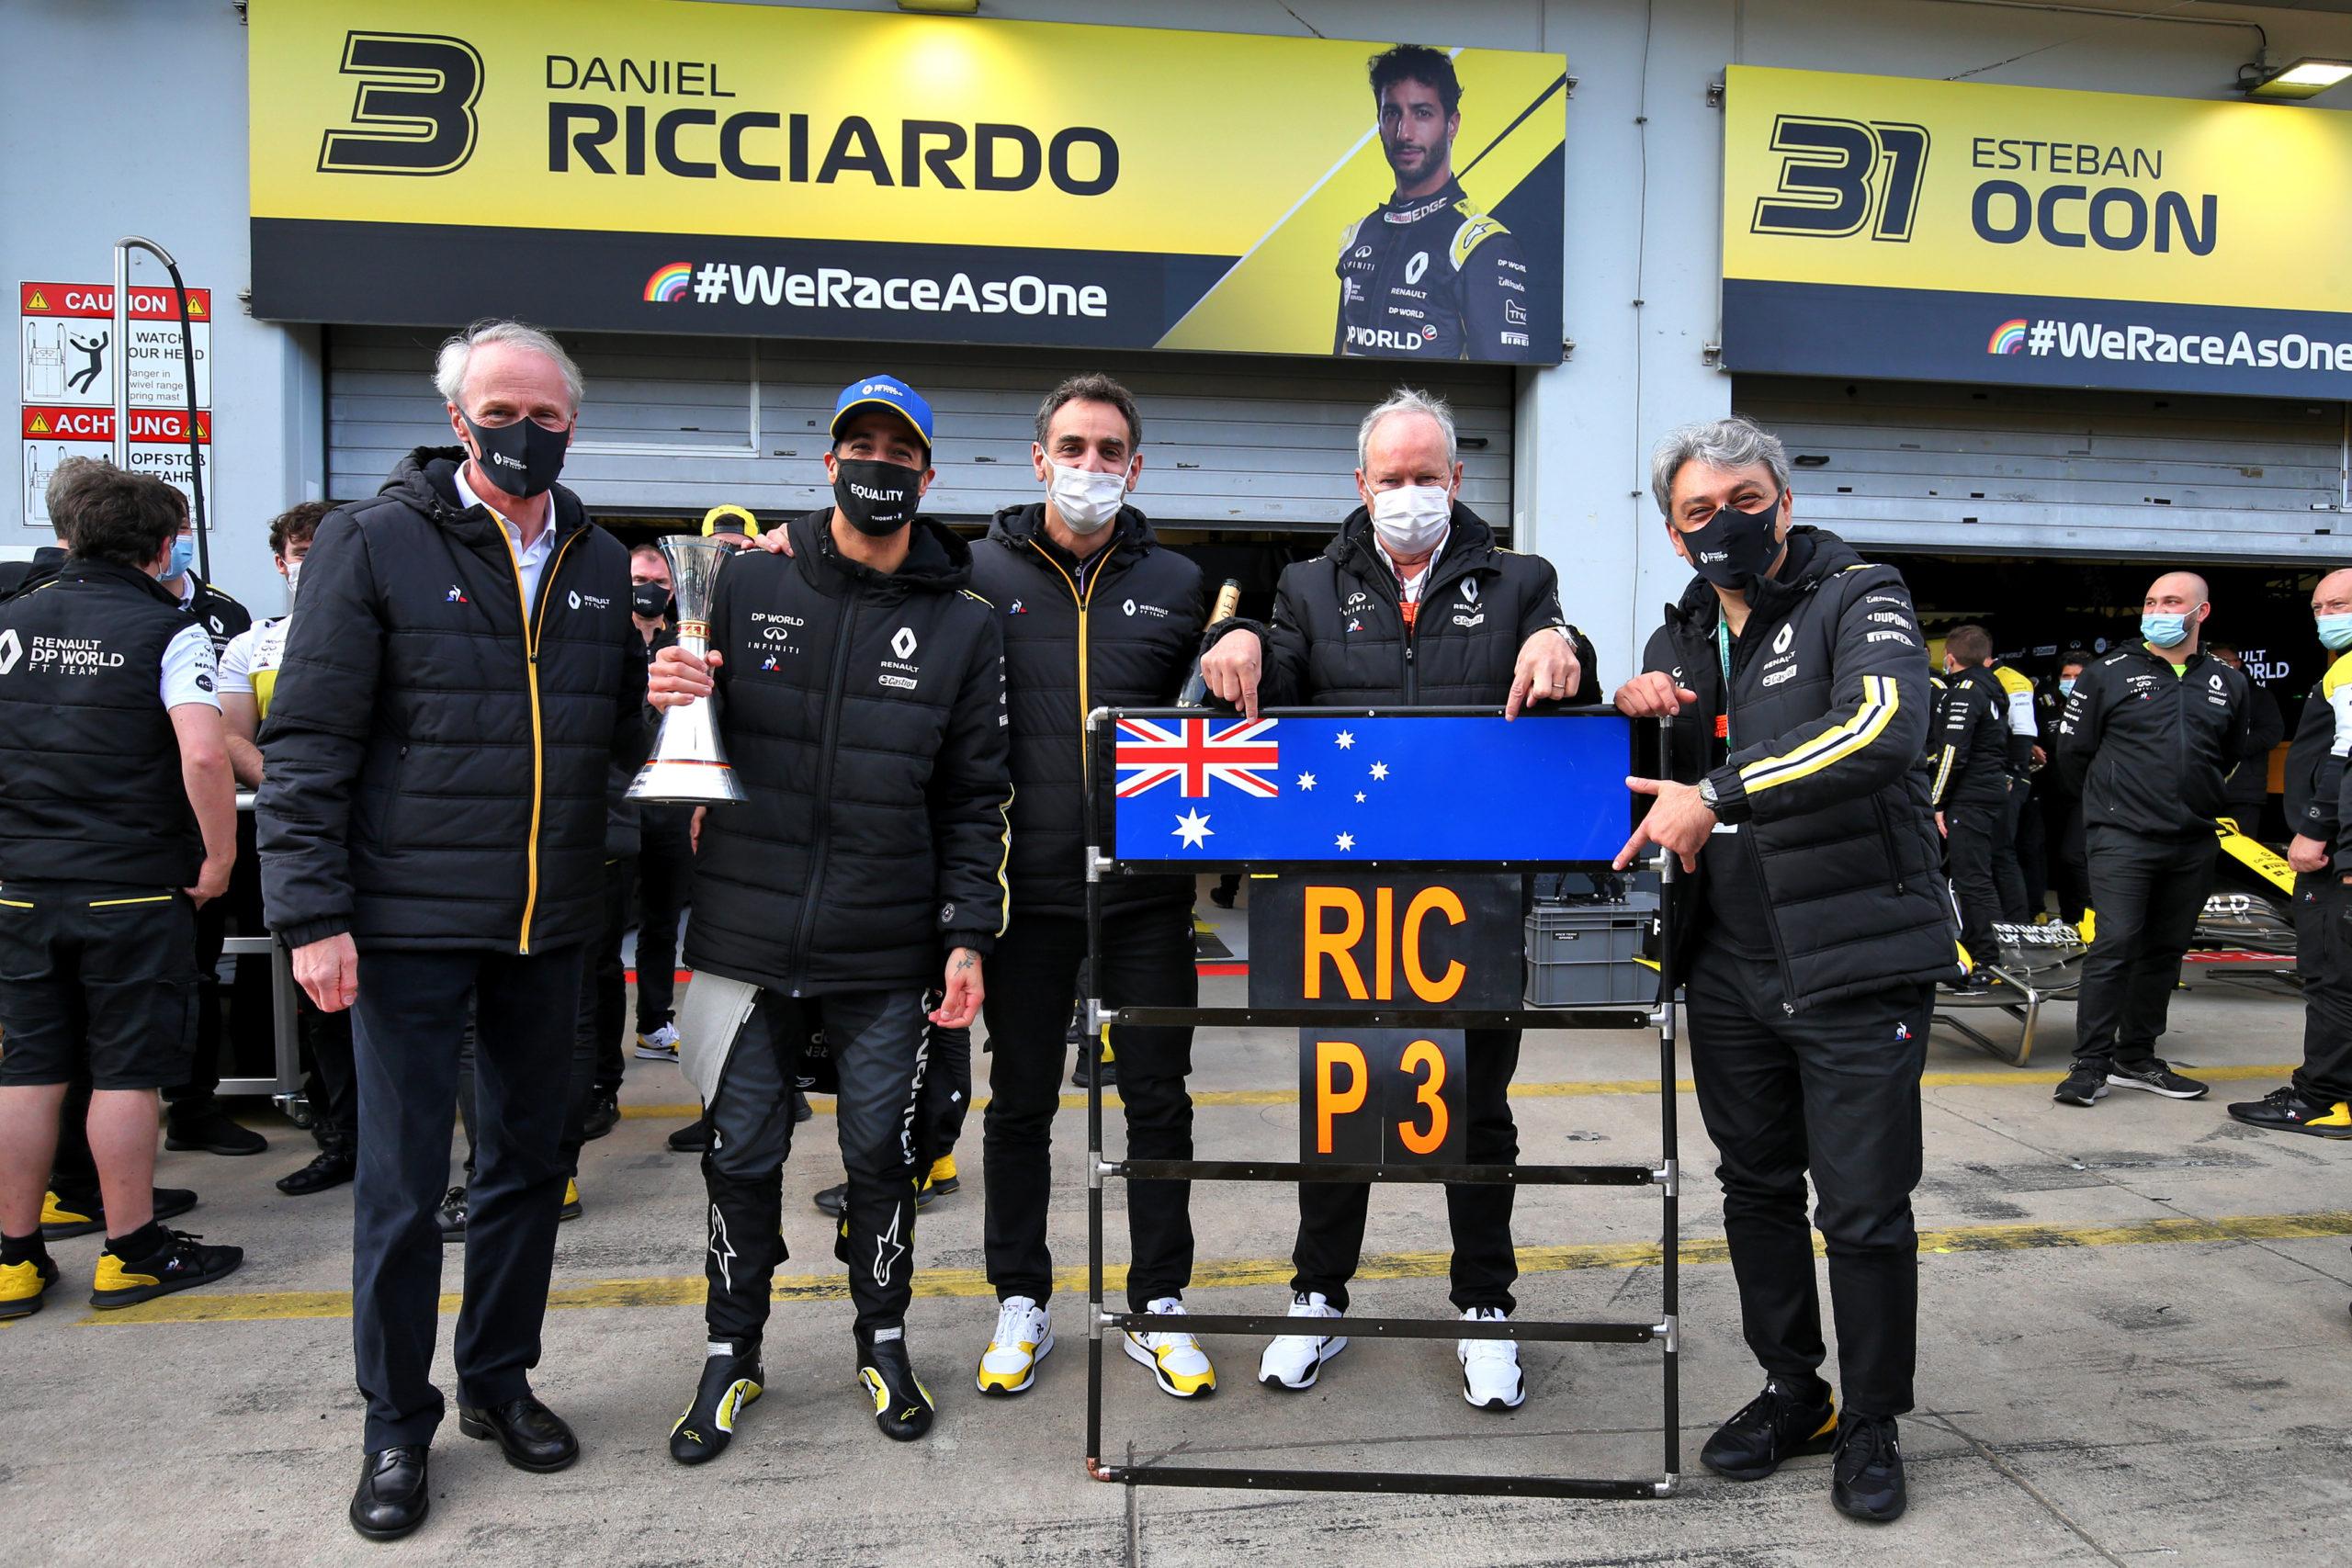 Renault F1 Team celebrates third position for Daniel Ricciardo (AUS) Renault F1 Team (L to R): Jean-Dominique Senard (FRA) Renault Chairman; Daniel Ricciardo (AUS) Renault F1 Team; Cyril Abiteboul (FRA) Renault Sport F1 Managing Director; Jerome Stoll (FRA) Renault Sport F1 President; Luca de Meo (ITA) Groupe Renault Chief Executive Officer. Eifel Grand Prix, Sunday 11th October 2020. Nurbugring, Germany.